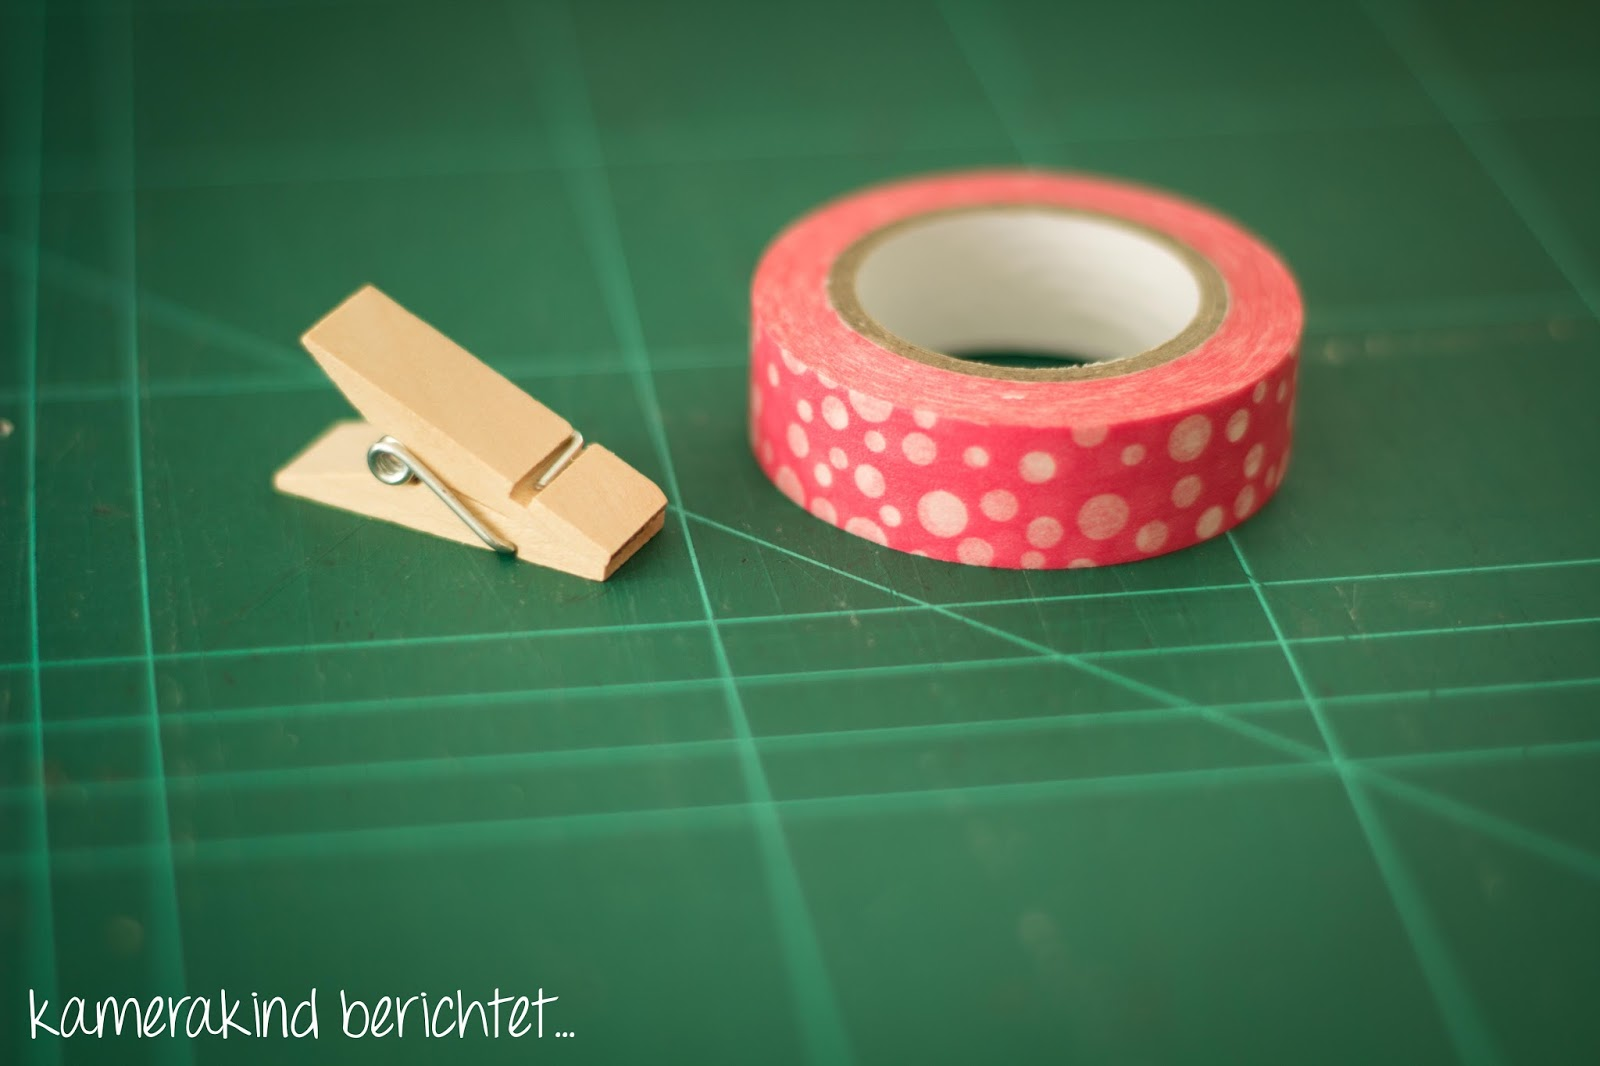 Perfekte Kombination: Holzklammern und Washi Tape